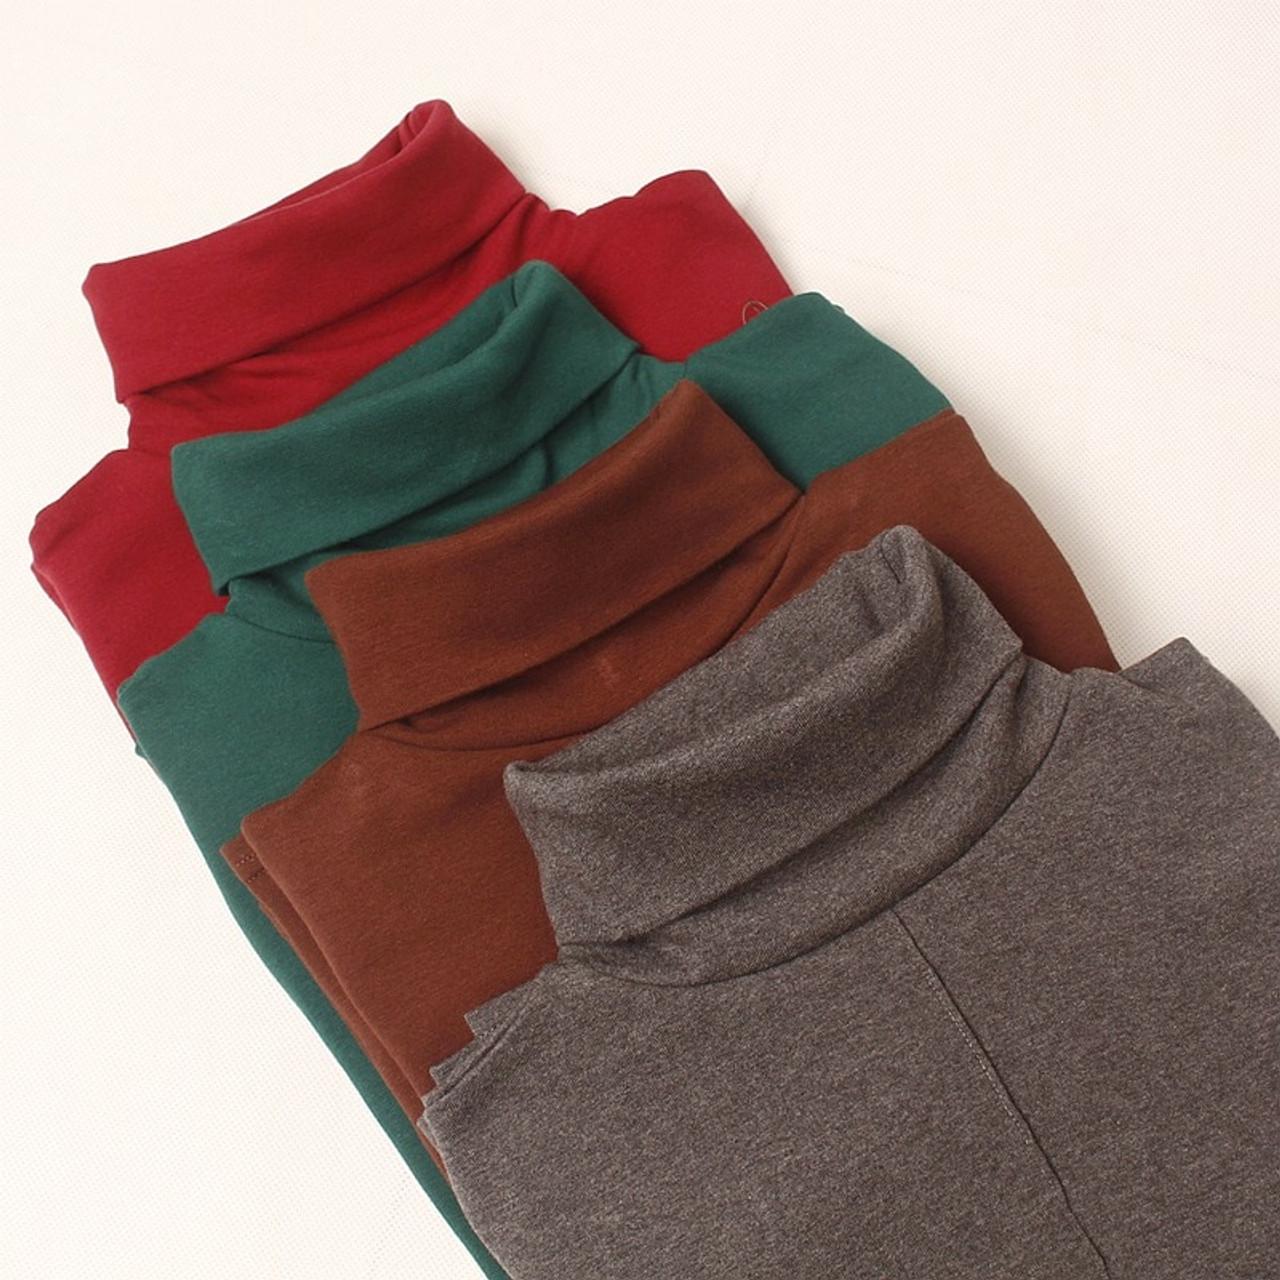 f9608b2df4 High Quality 95% Cotton Autumn Winter Women Sweater Plus Size M-XL  Turtleneck Pullover Jumper Soft Warm Female Sweater Top - OnshopDeals.Com